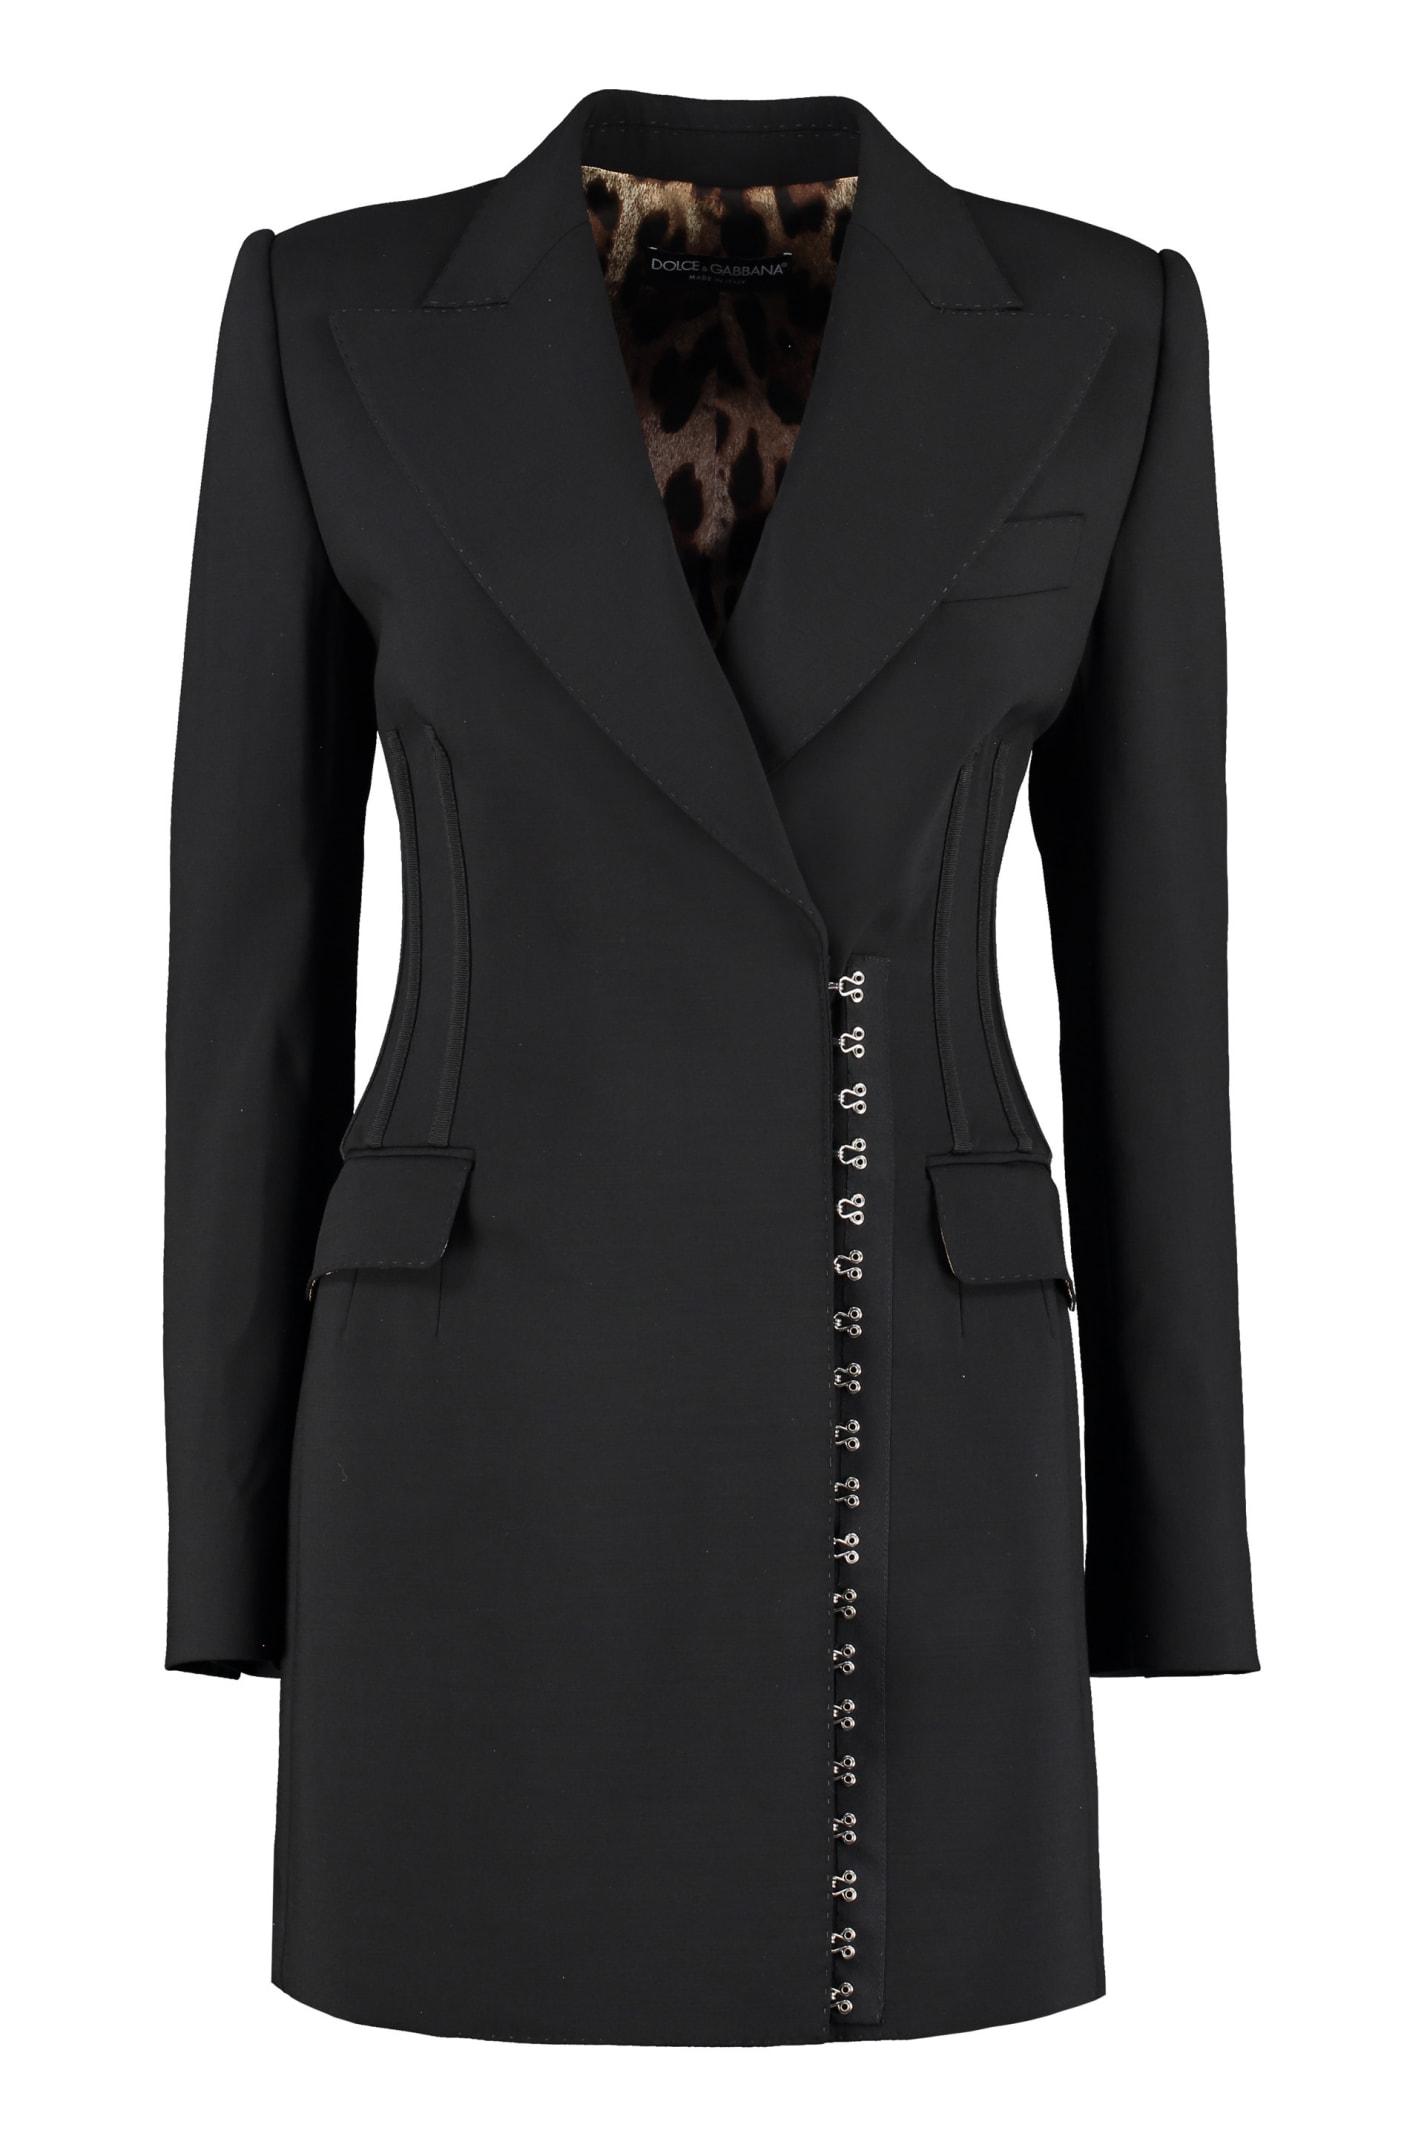 Dolce & Gabbana Stretch Virgin Wool Blazer In Black